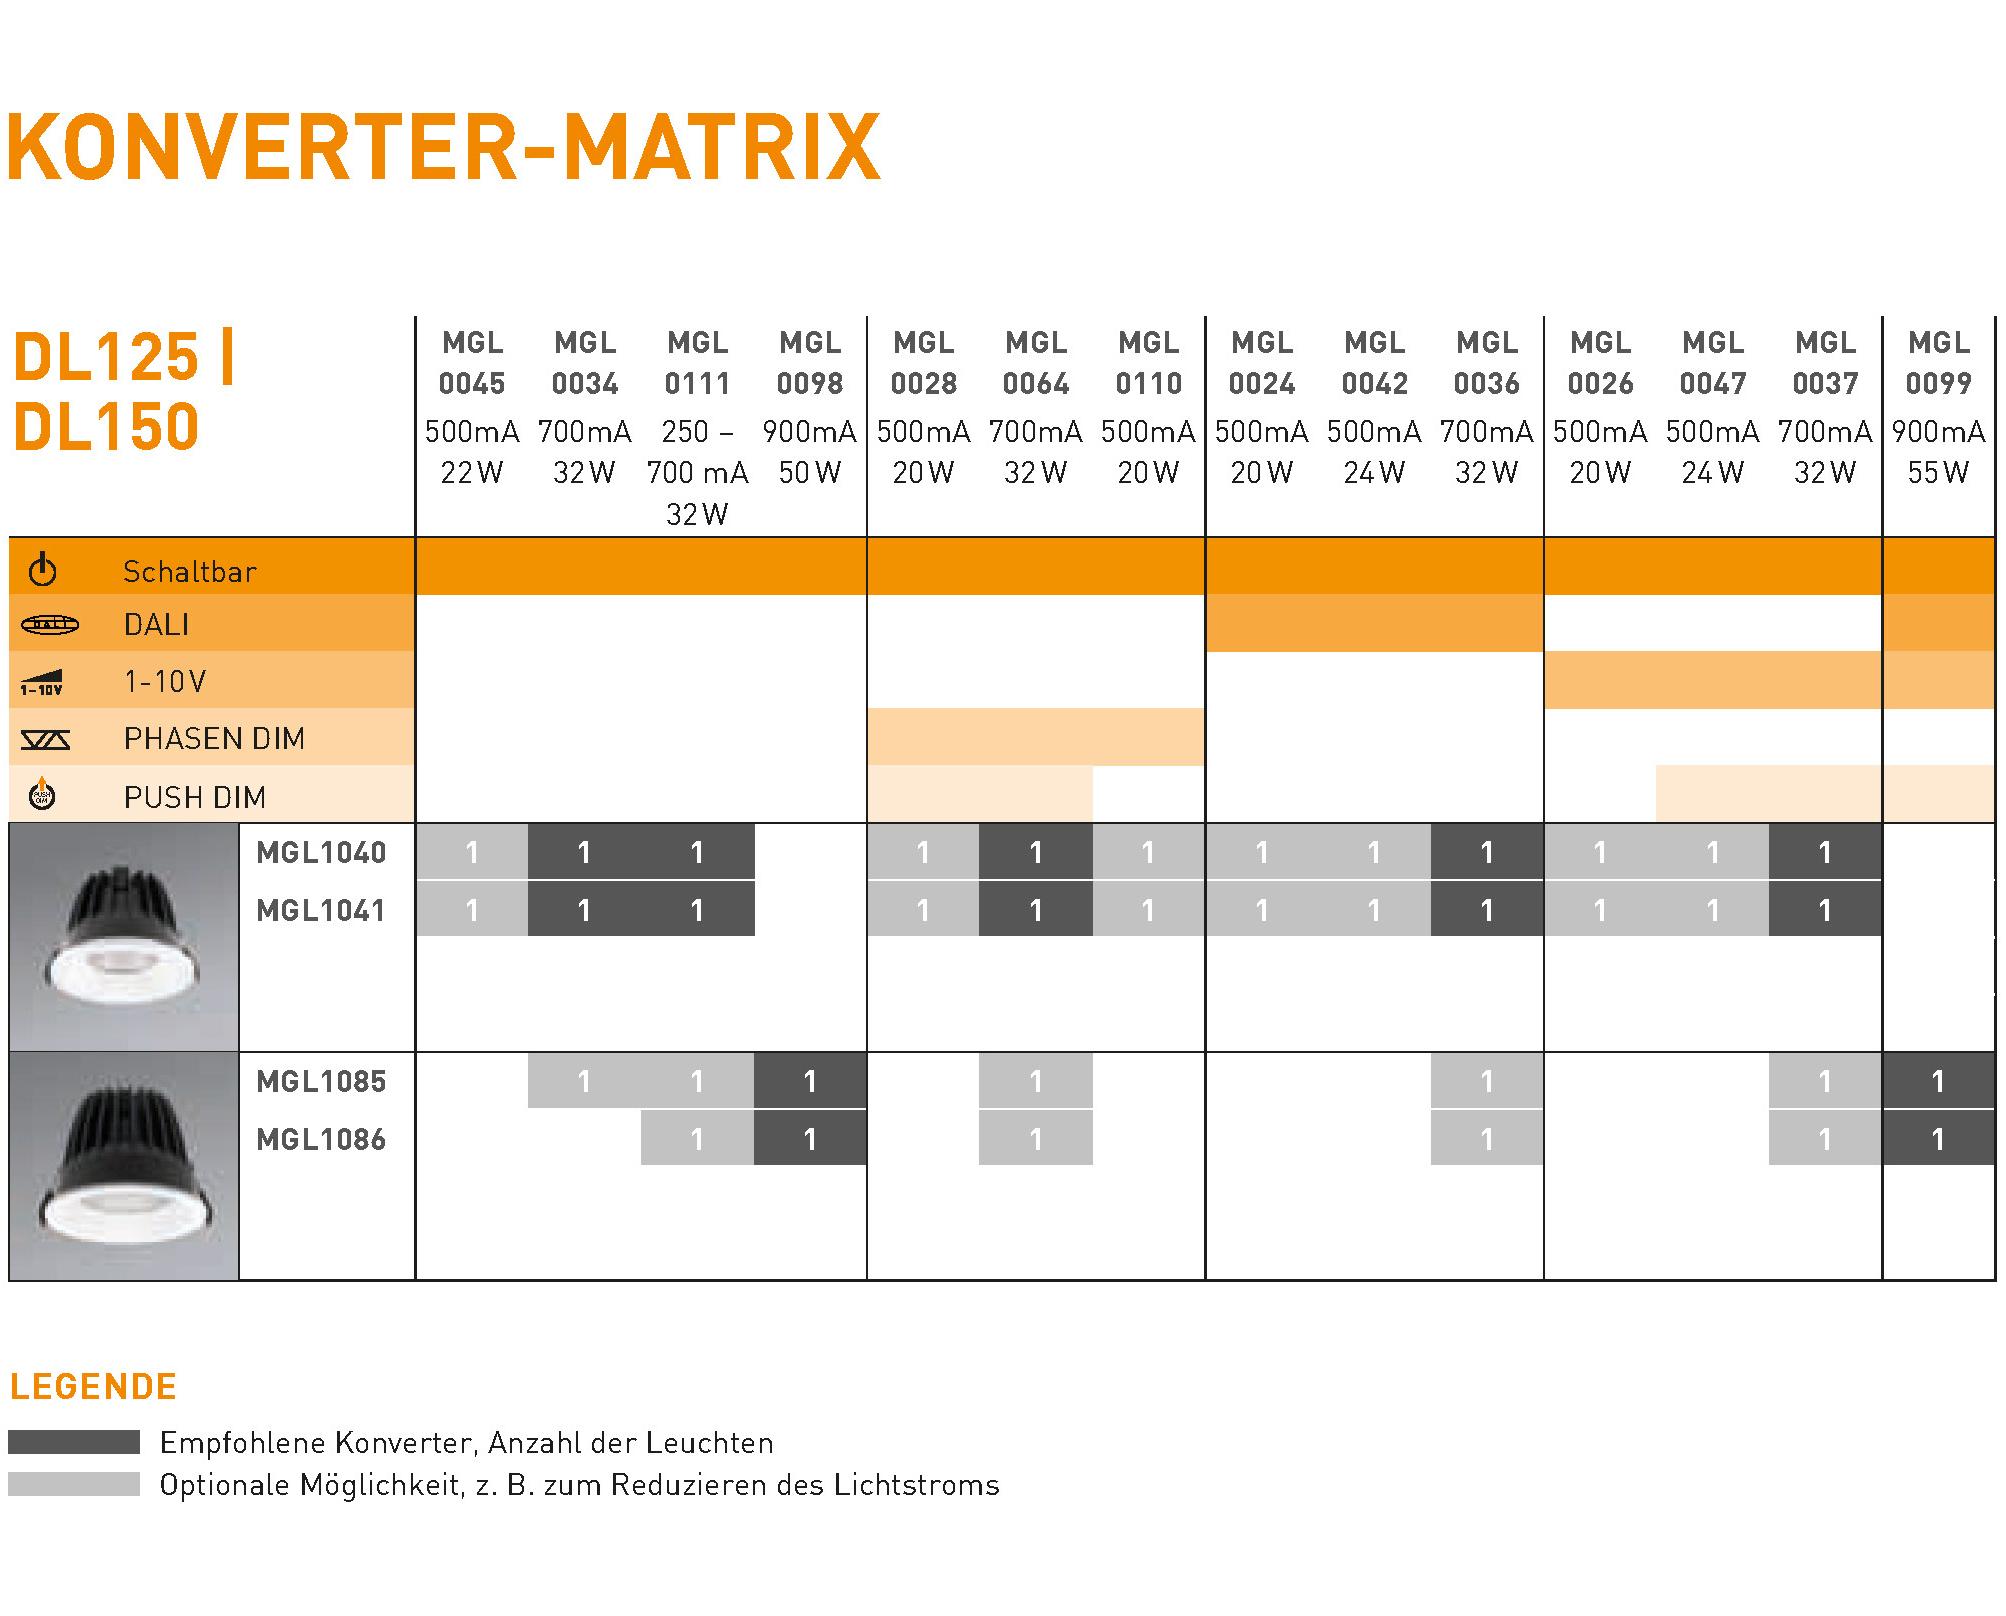 DL125 150 Konvertermatrix